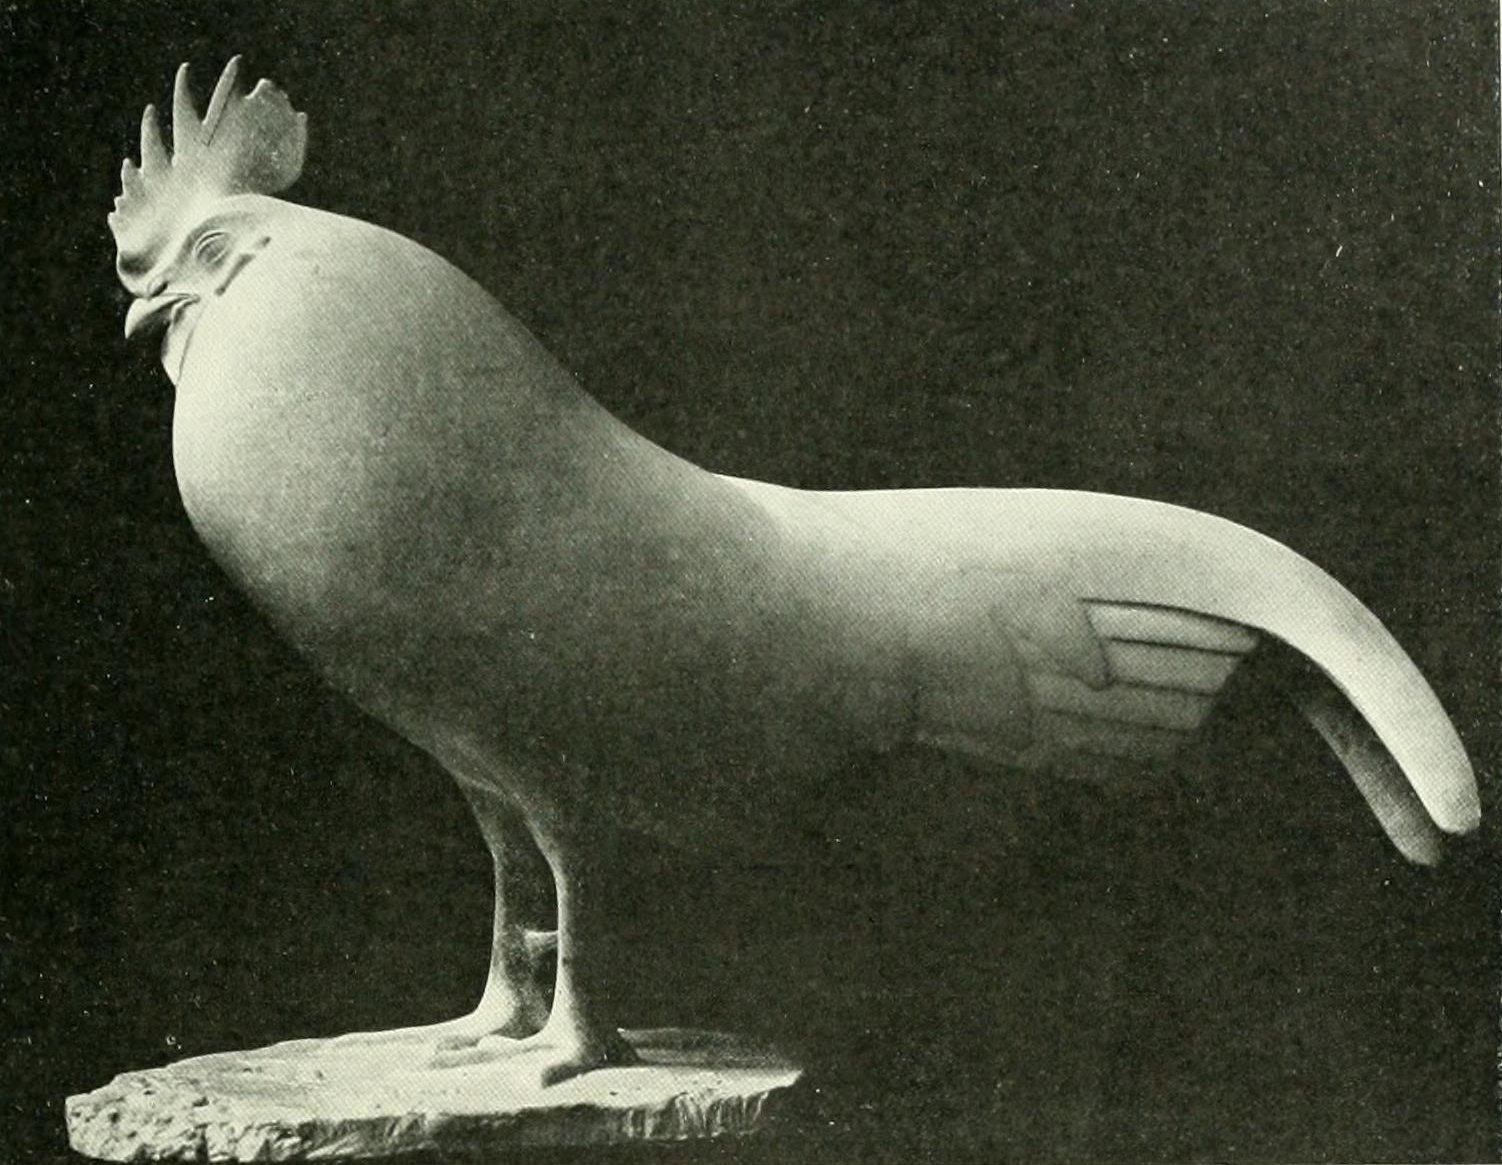 f0dbf30a7ad File Pompon - Coq.jpg - Wikimedia Commons